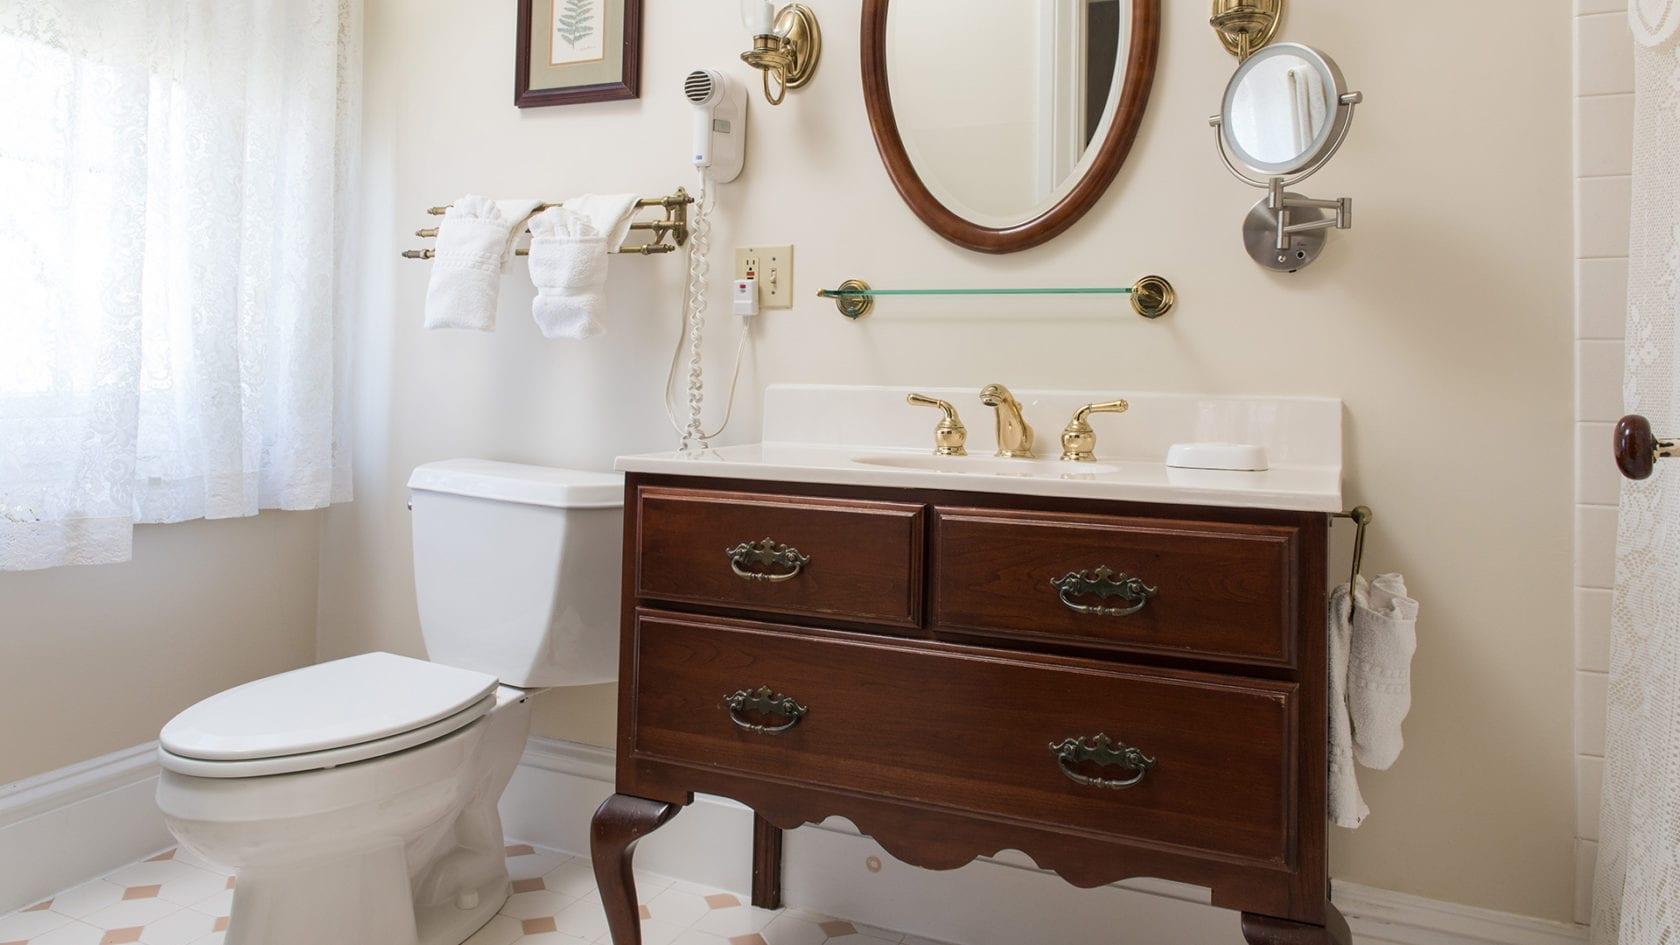 Rhoads Suite Bathroom